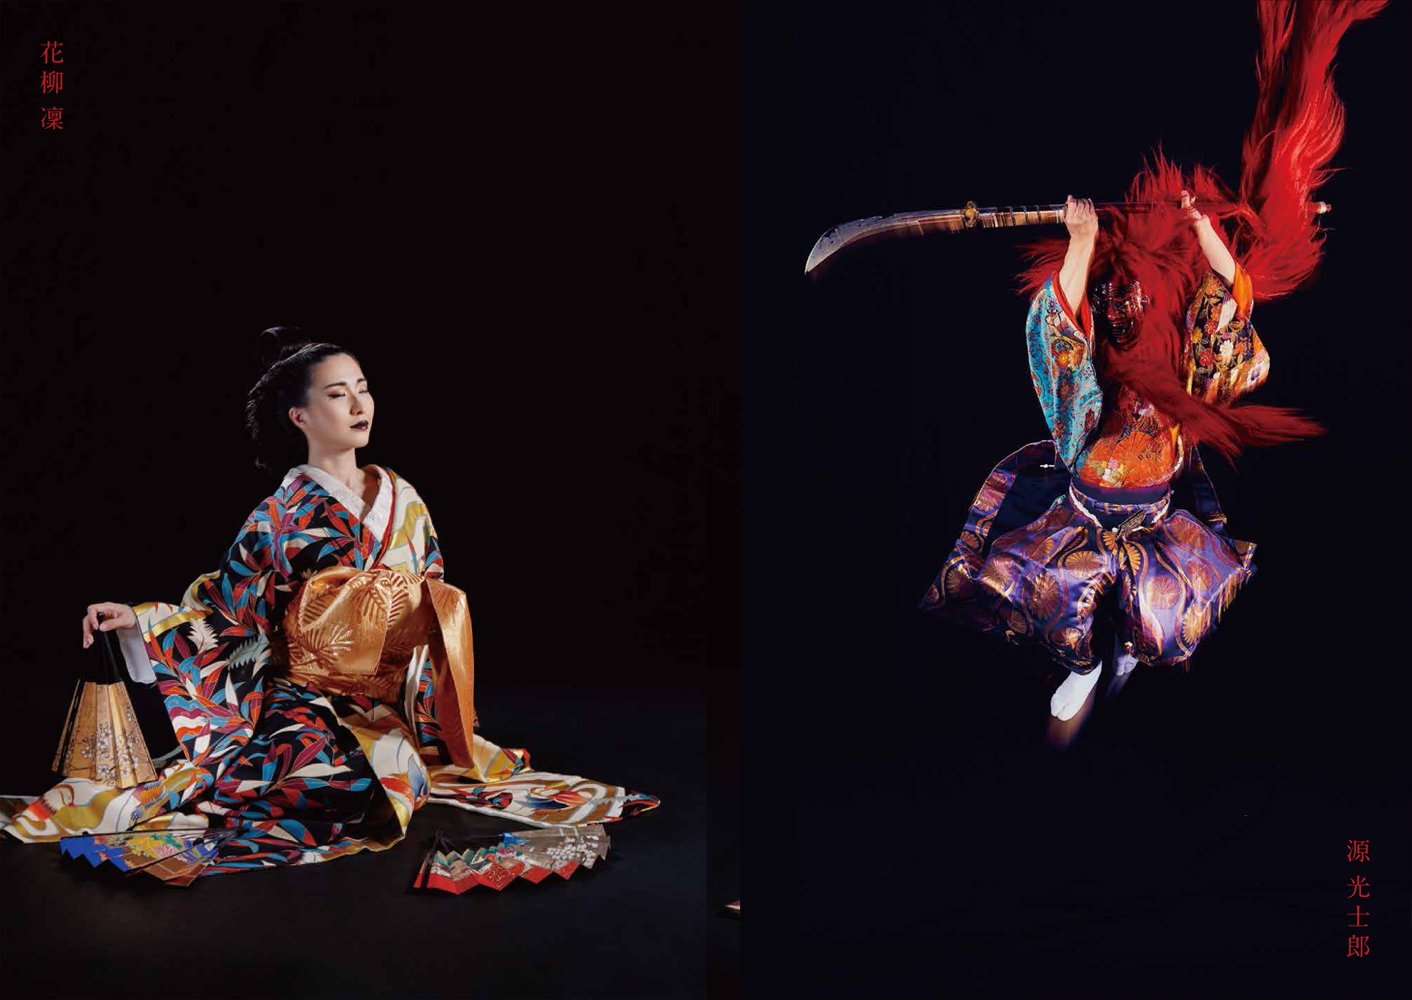 「NEO舞台」パフォーミングアートより花柳凜(左)、武楽座 源光士郎(右)